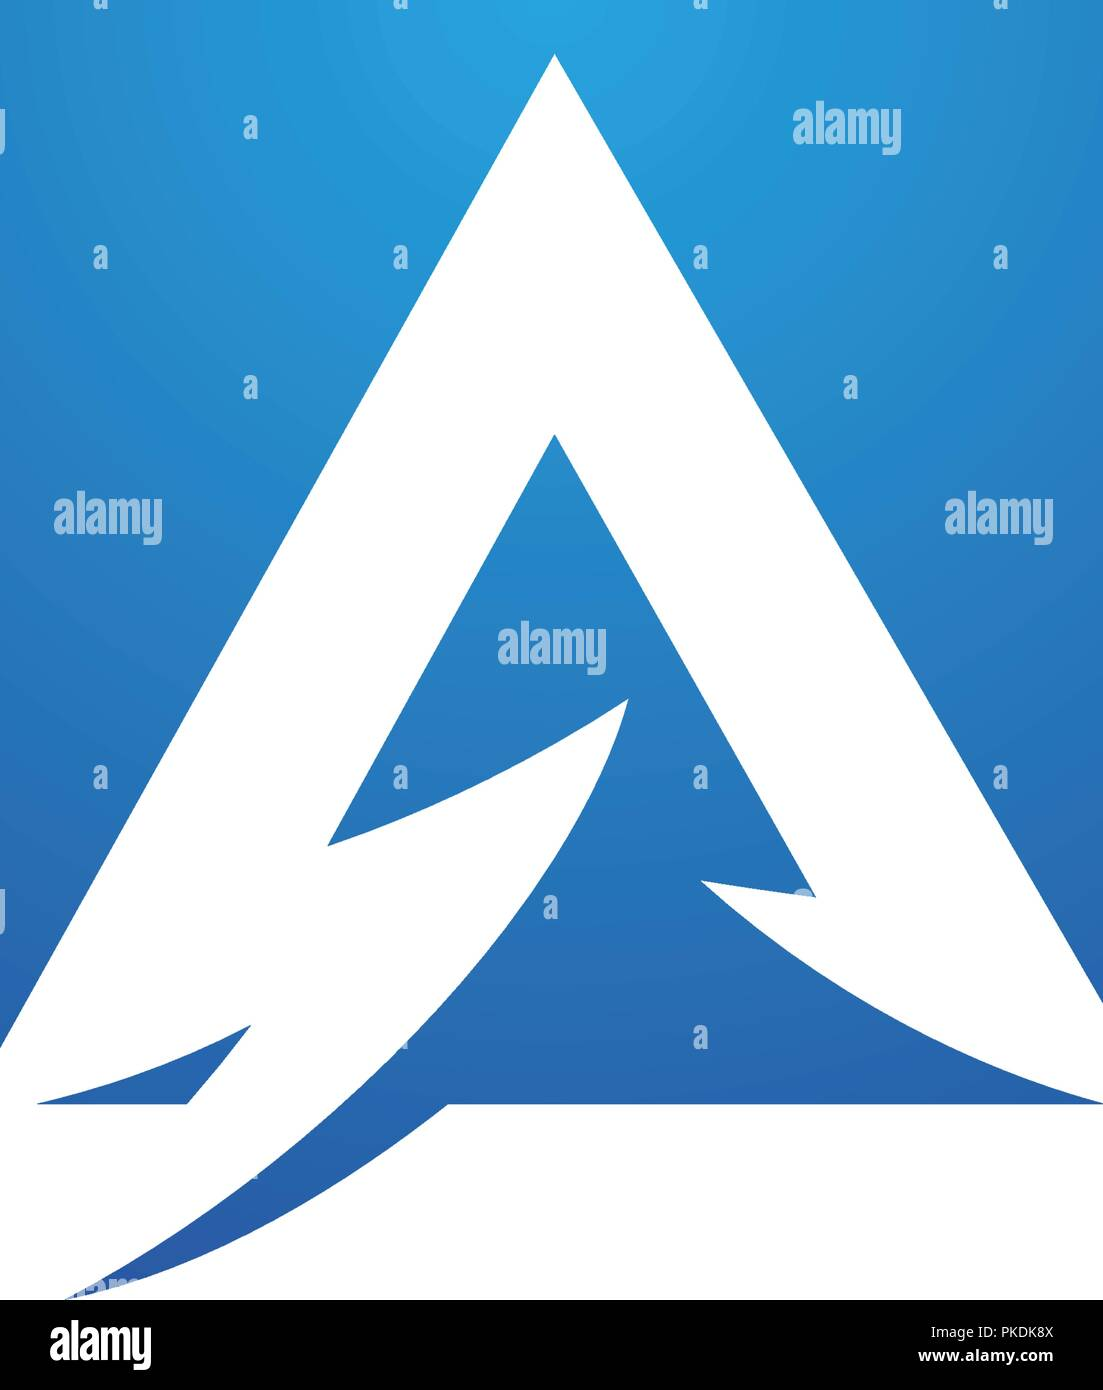 a letter lightning logo template vector icon illustration design